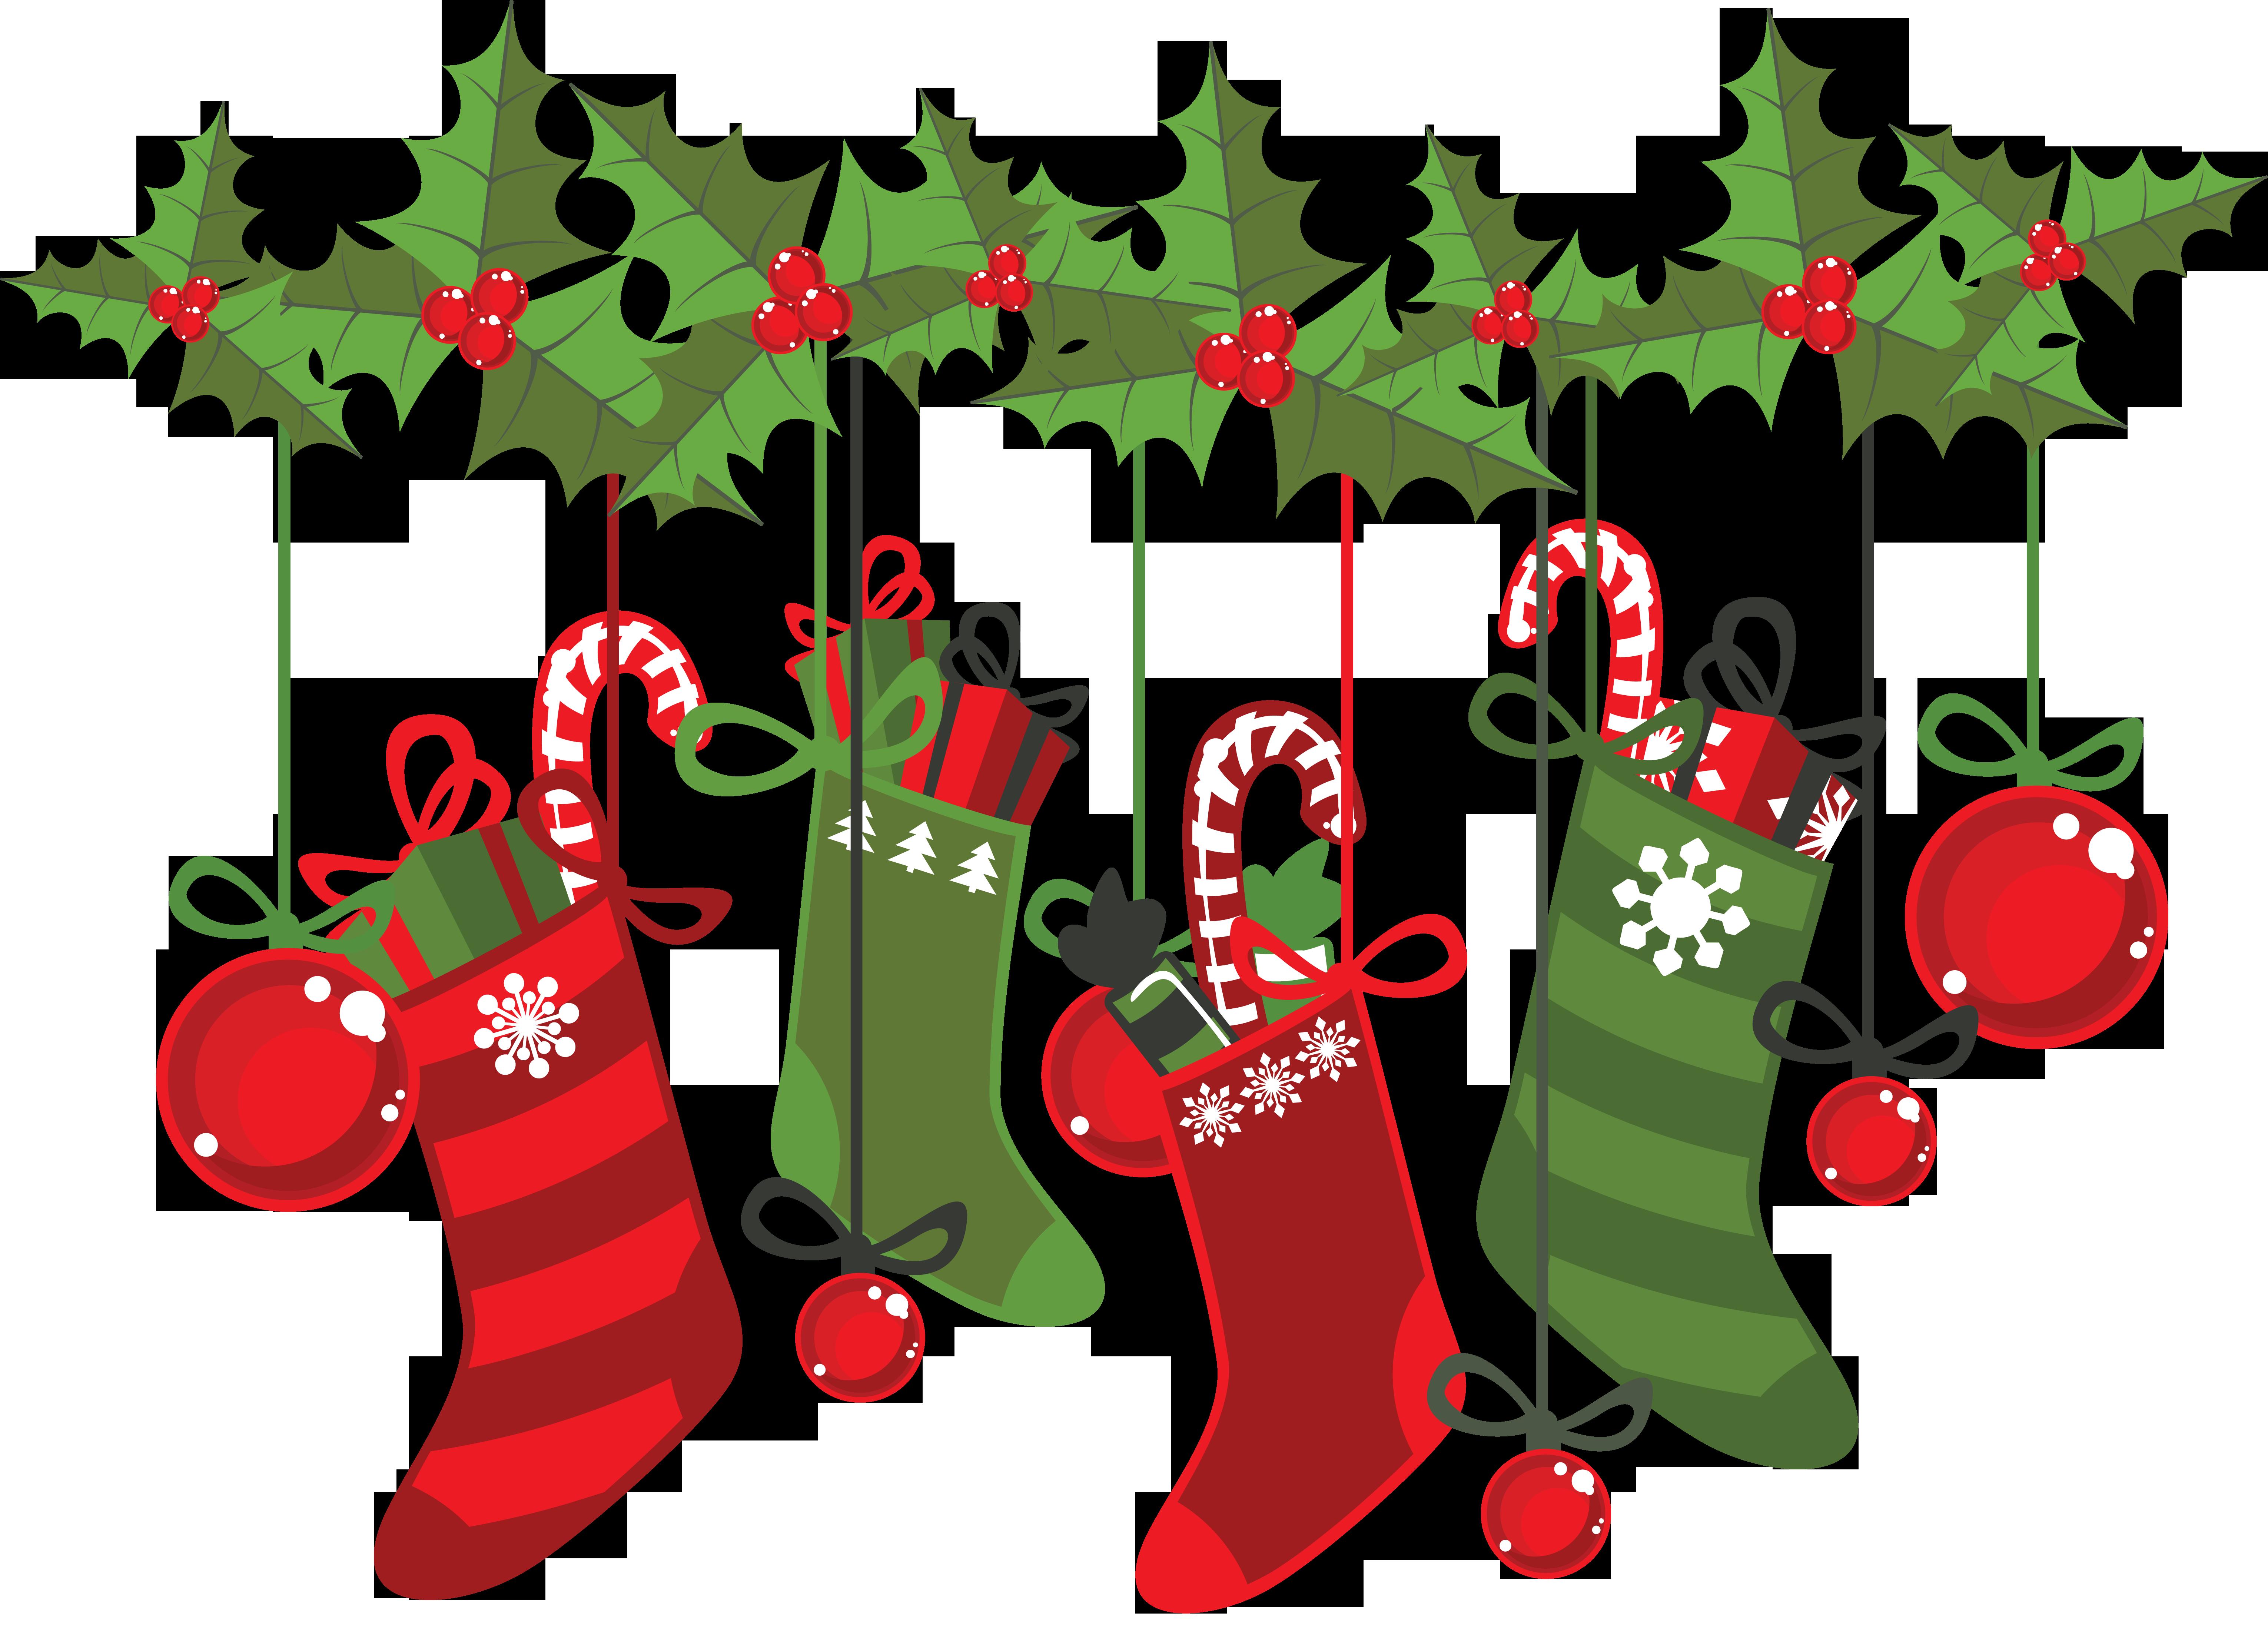 Hojas para el mes de diciembre clipart vector freeuse library Navidad clipart 2 » Clipart Station vector freeuse library